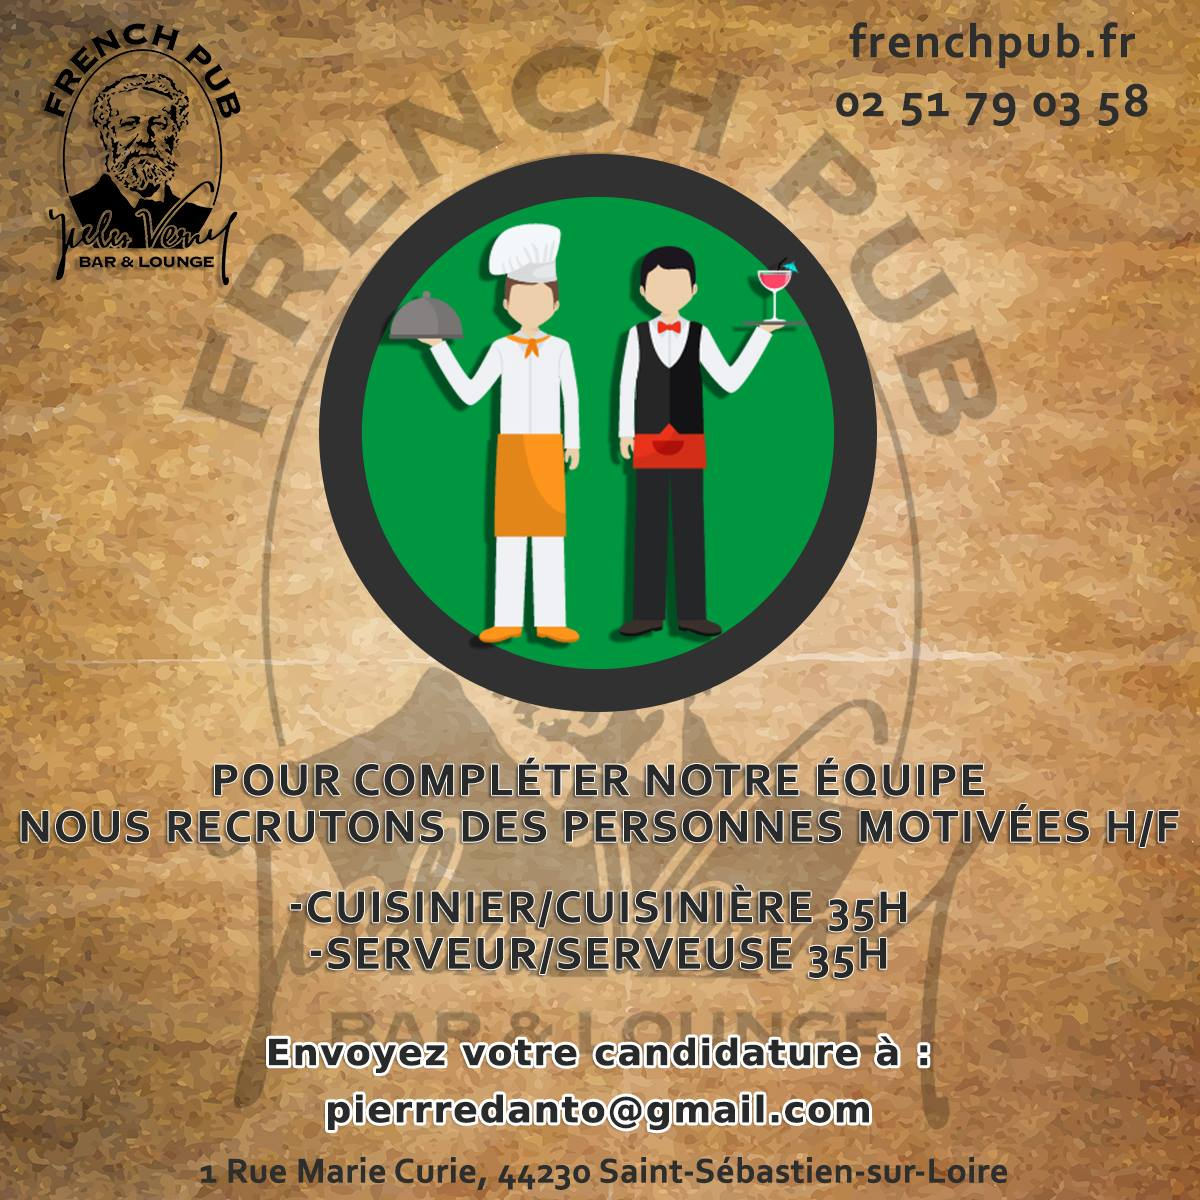 Recrutement : Hôtesse / Hôte d'accueil restaurant (H/F)